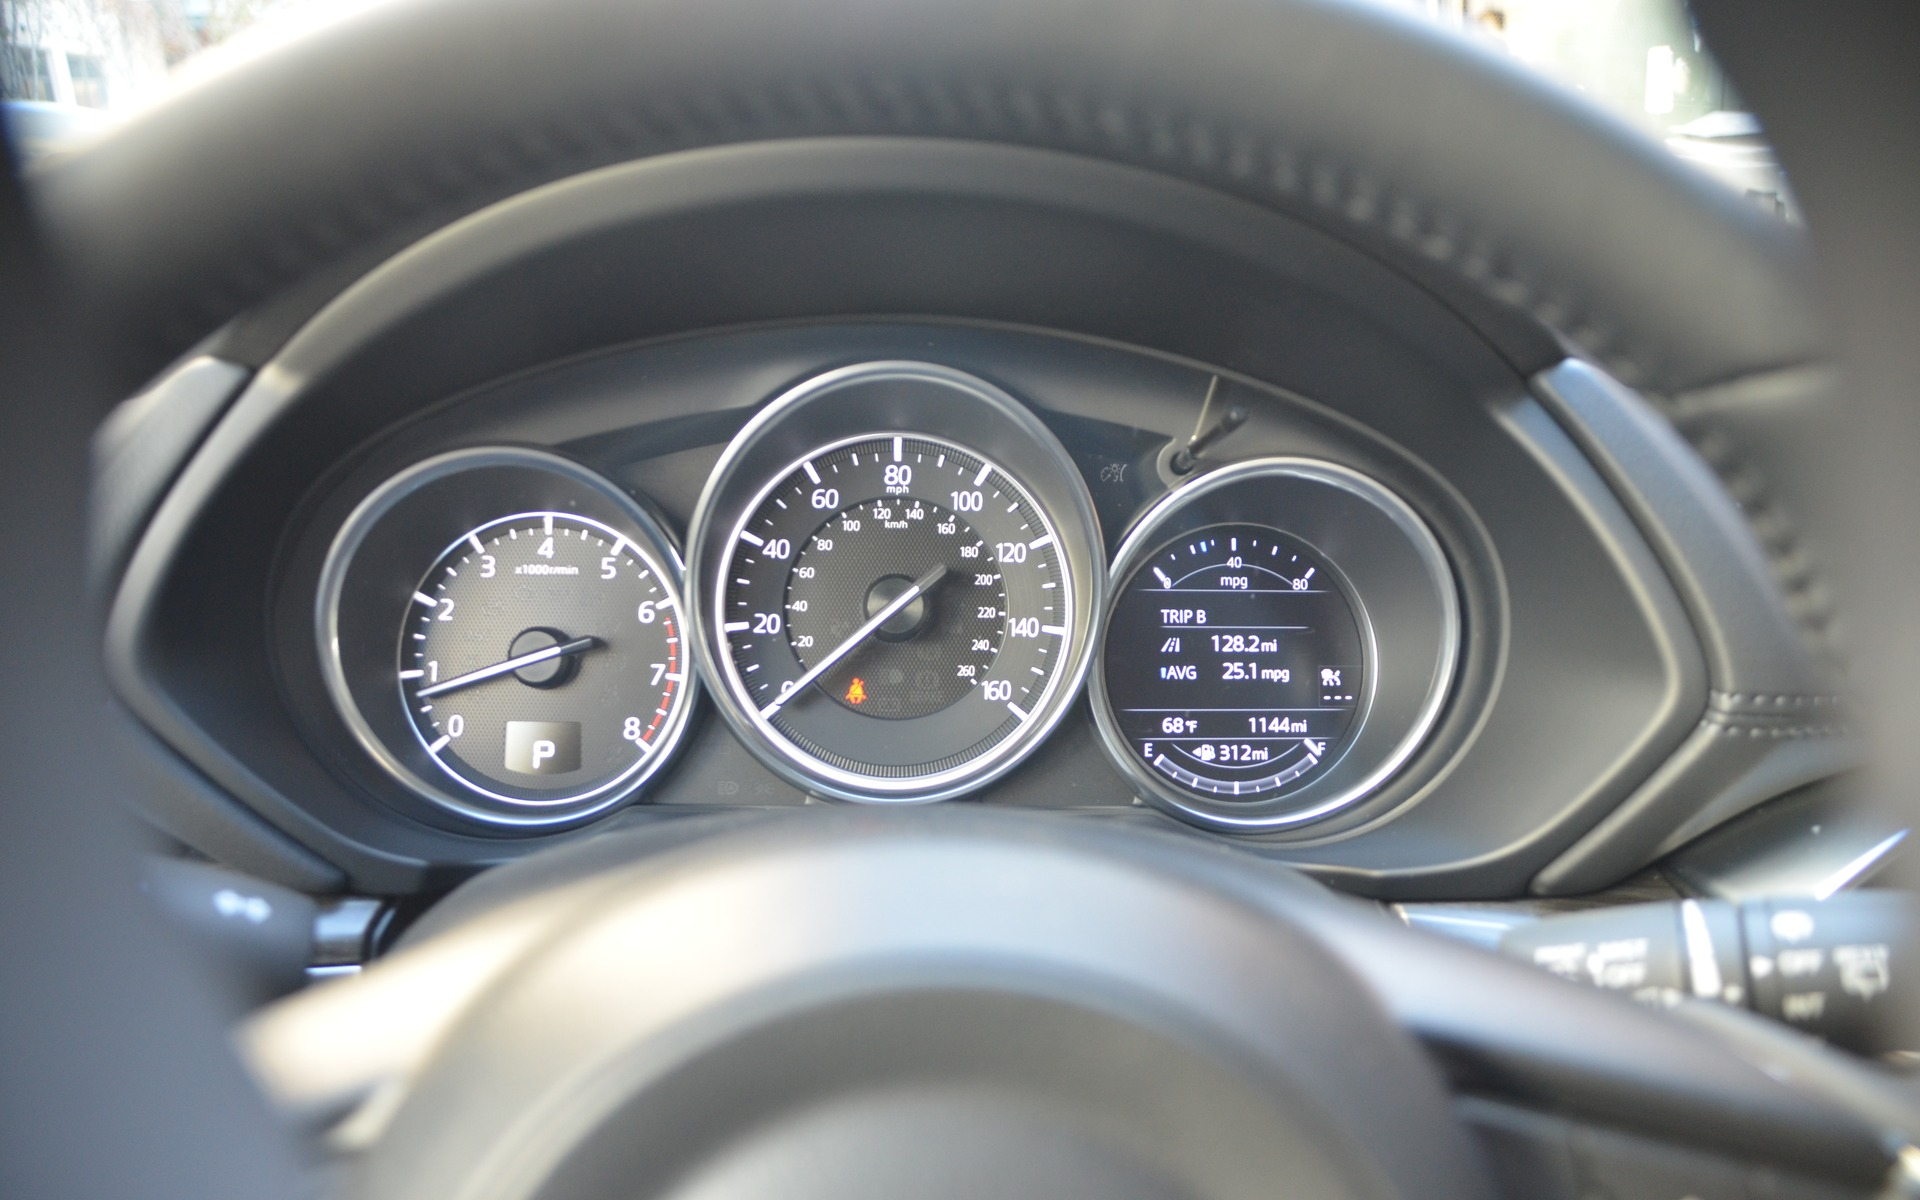 Mazda 3 2017 >> 2017 Mazda CX-5: Improving – Not Reinventing – the Wheel - 4/19